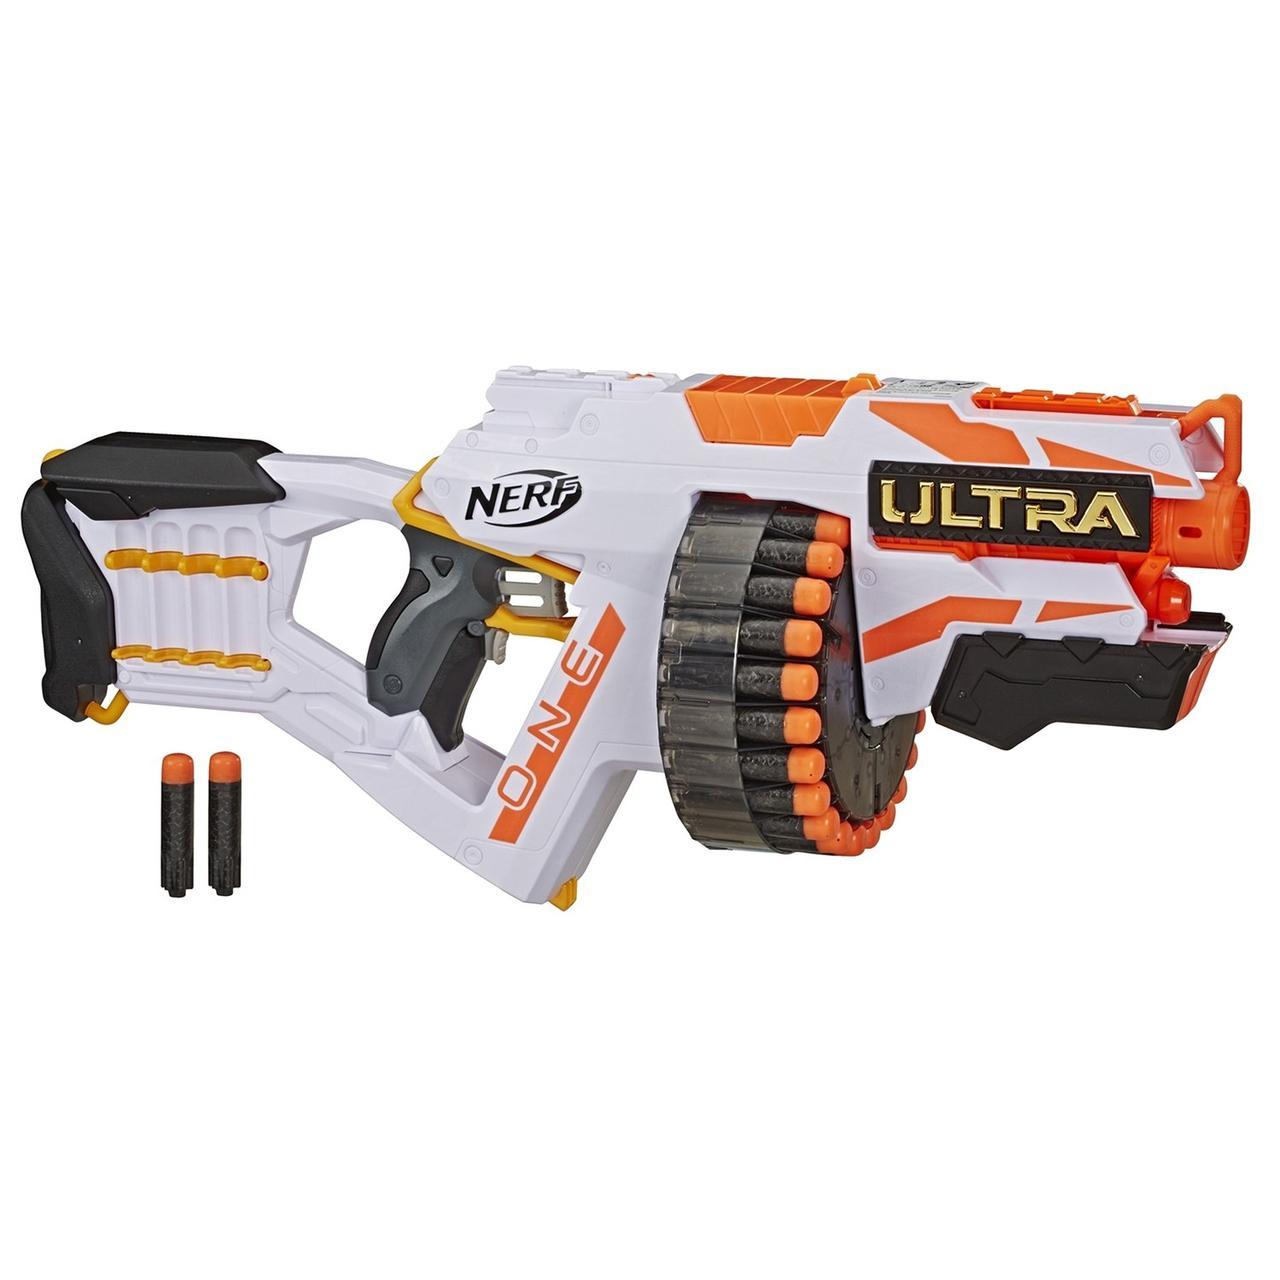 "Hasbro Nerf Ultra Бластер ""Ультра Уан"" Ultra One"